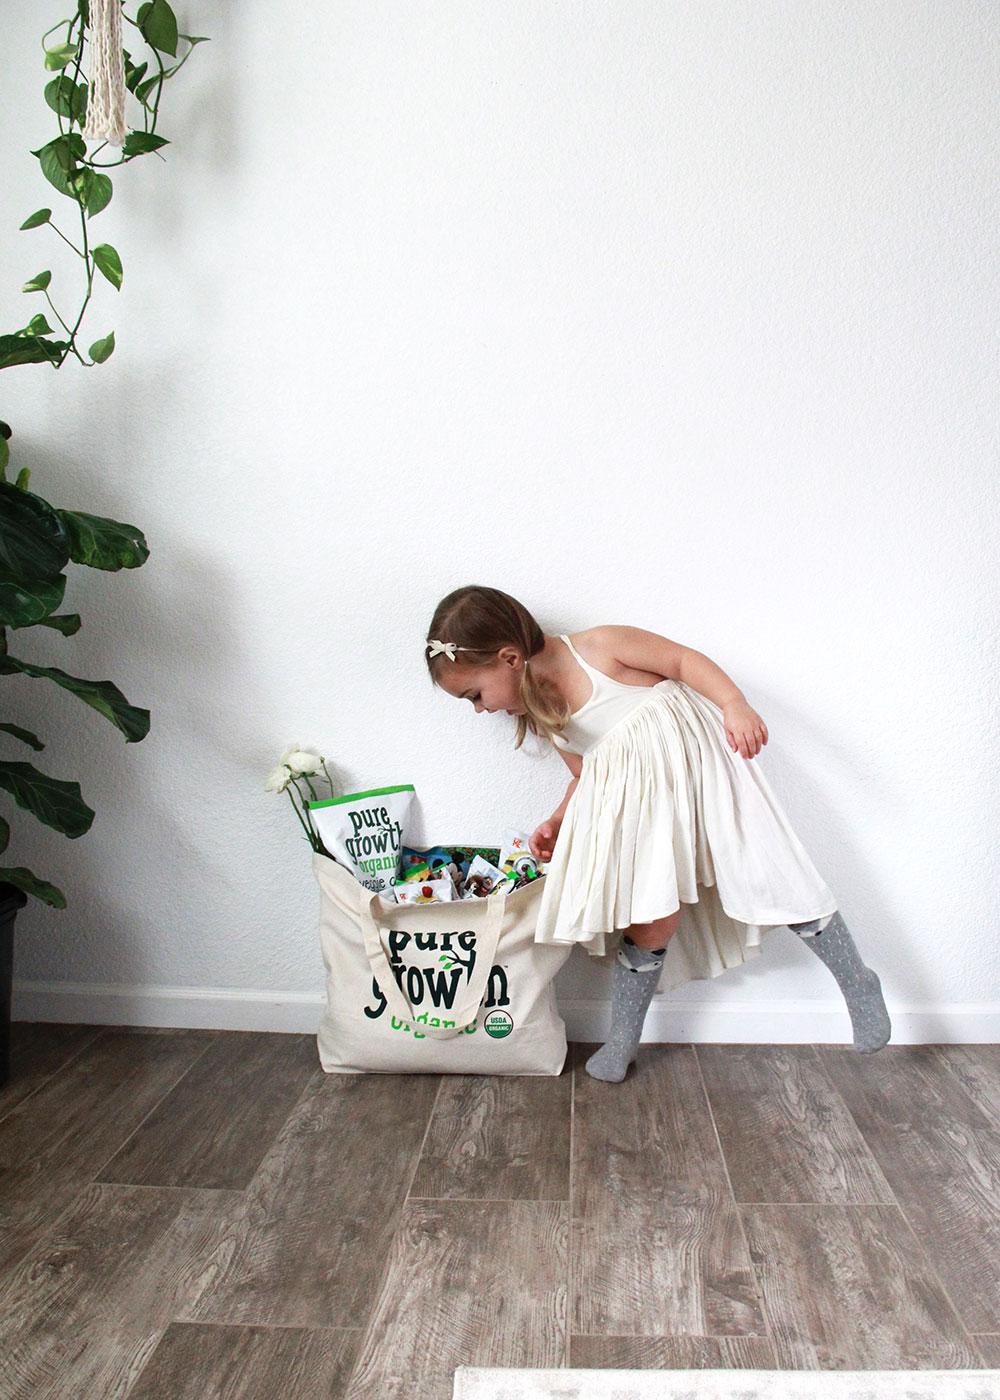 peek inside the bag of organic snacks! | thelovedesignedlife.com